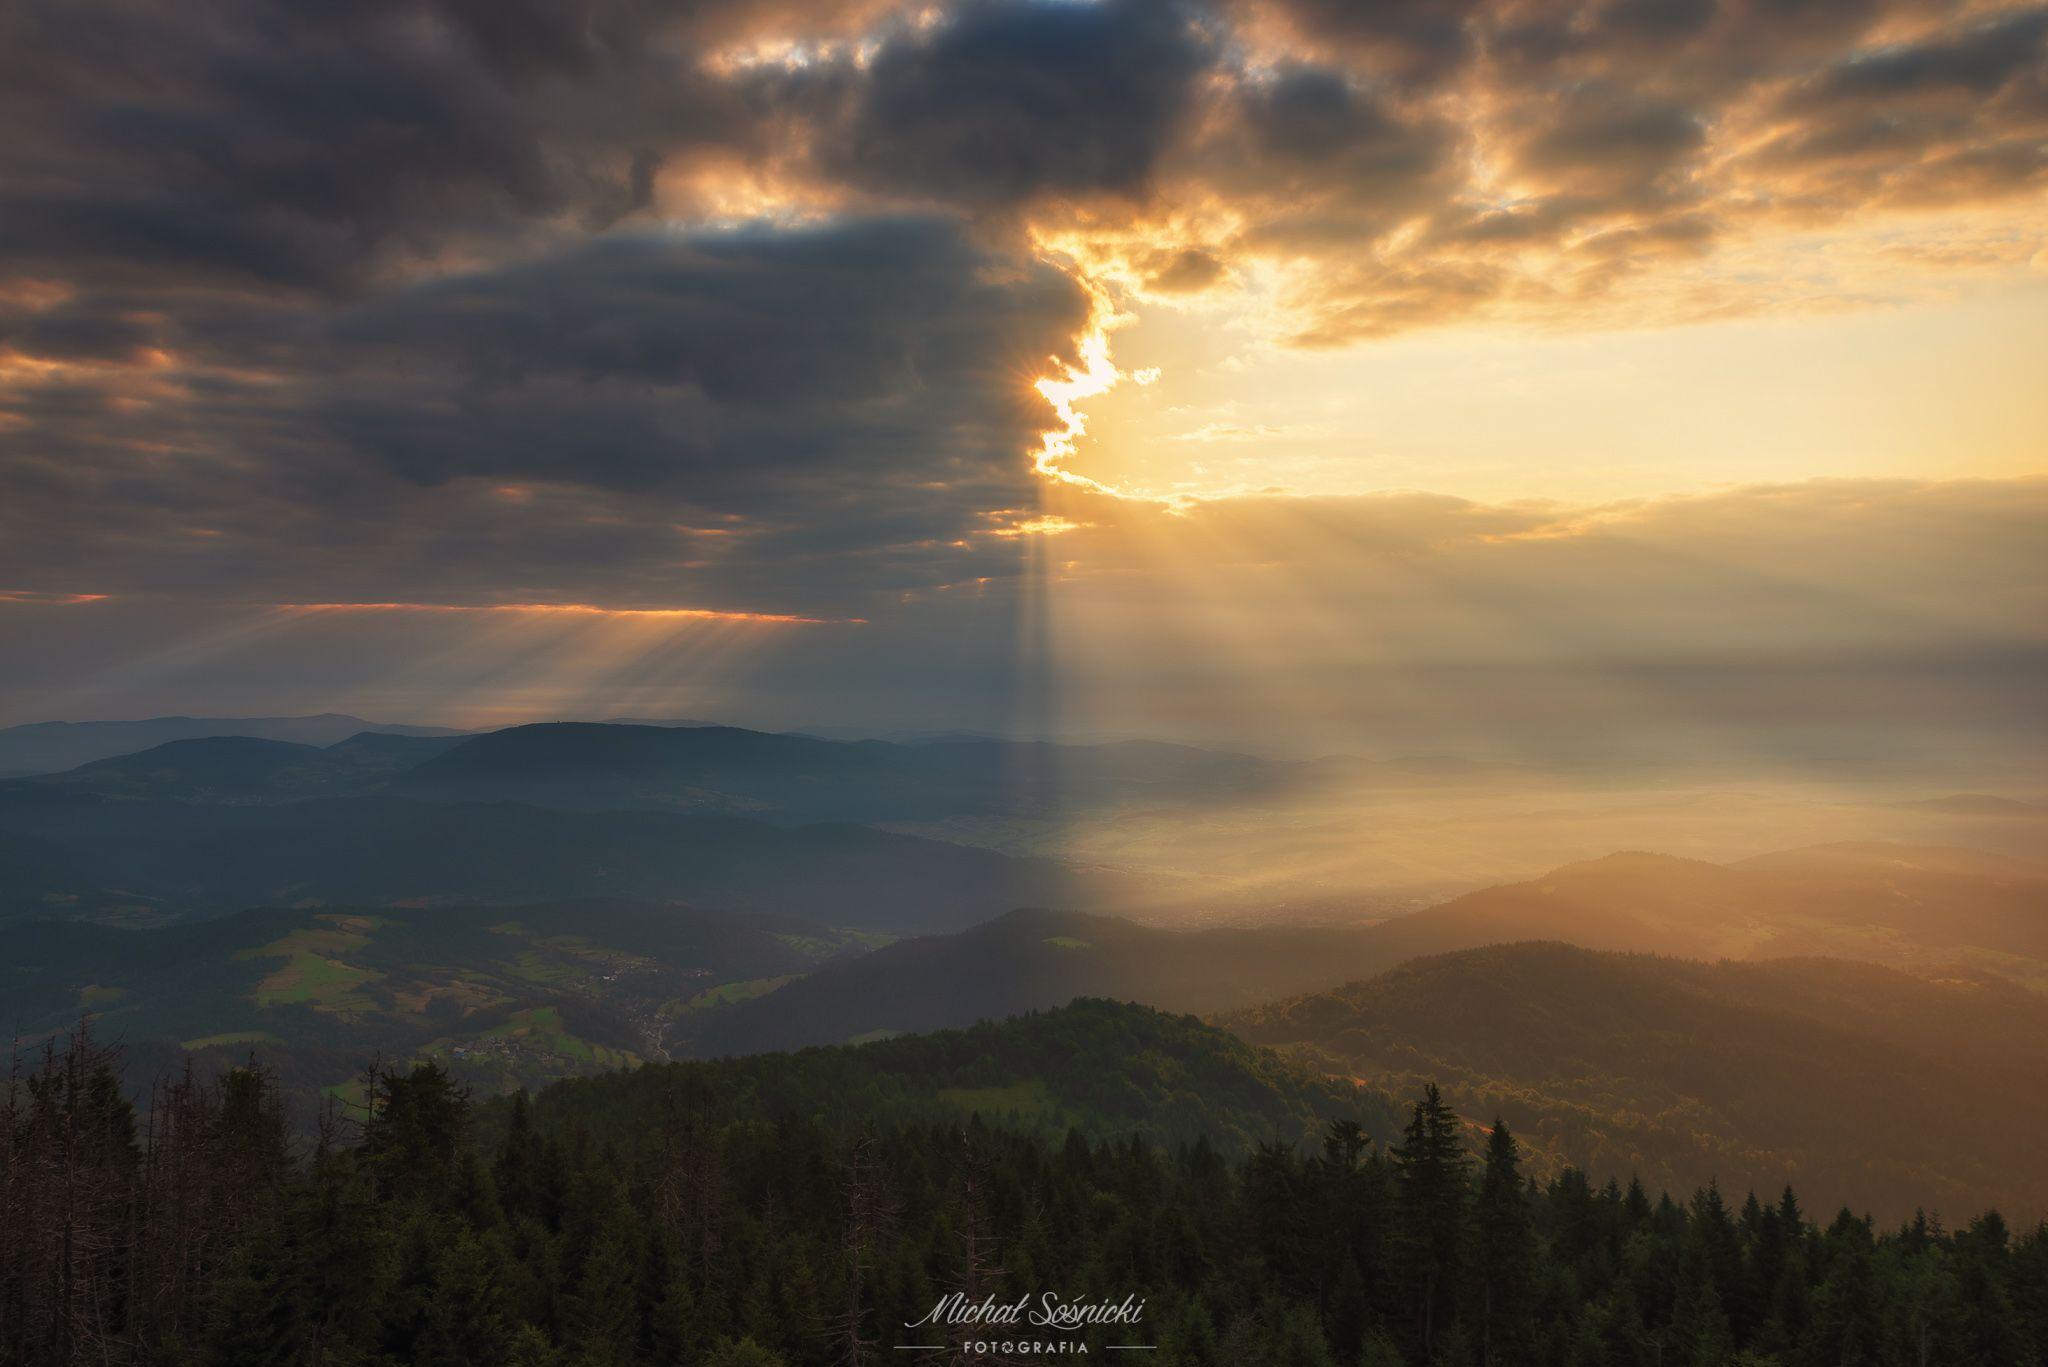 #mountains #sunrise #worlds #two #sky #laser #clouds #poland #gorc #pentax #benro, Sośnicki Michał